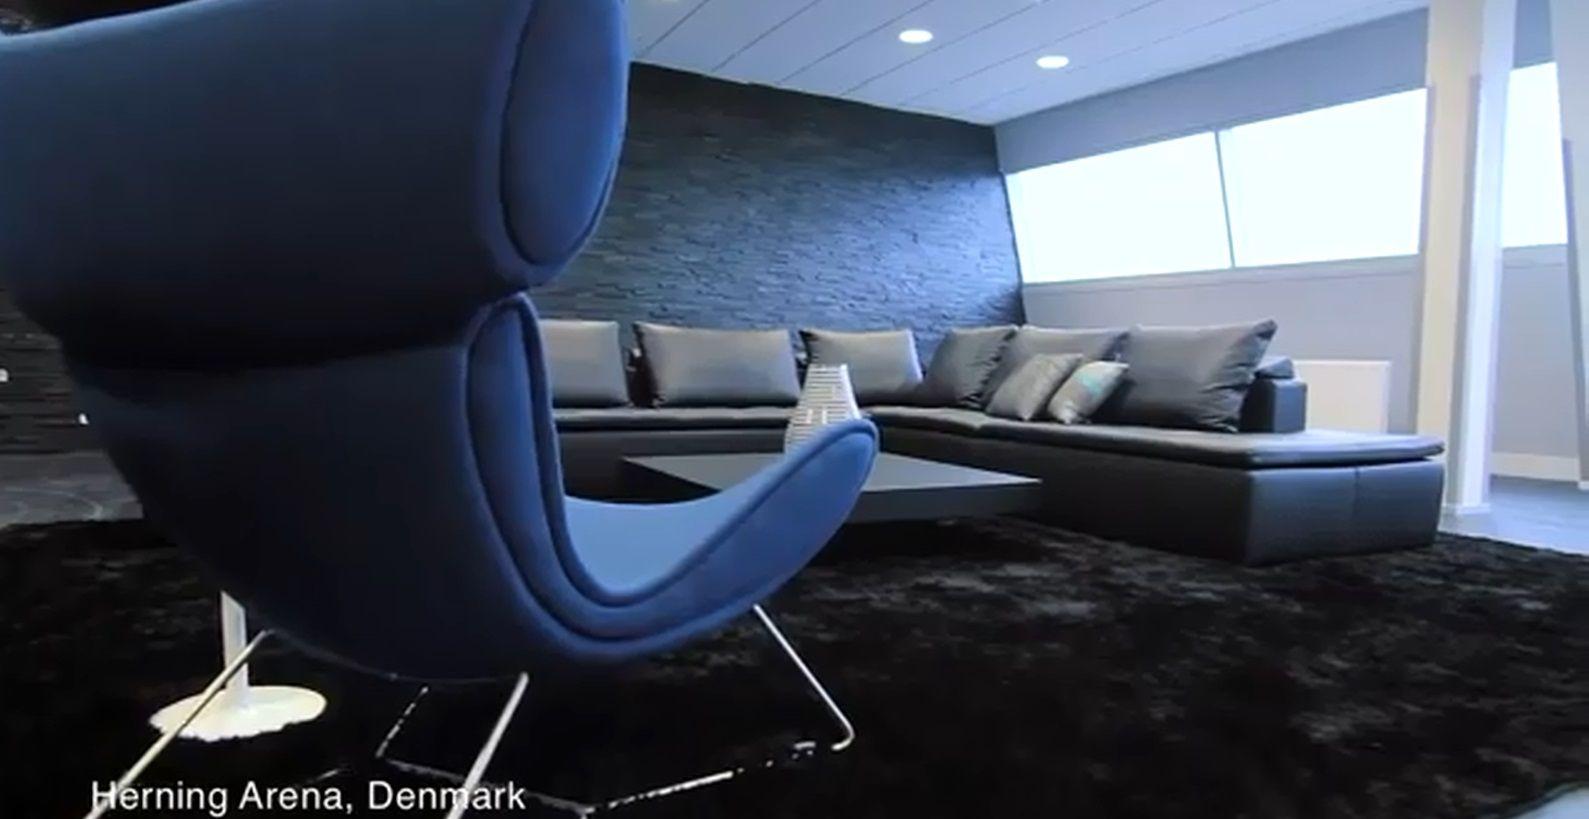 boconcept mezzo sofa imola chair in herning arena. Black Bedroom Furniture Sets. Home Design Ideas